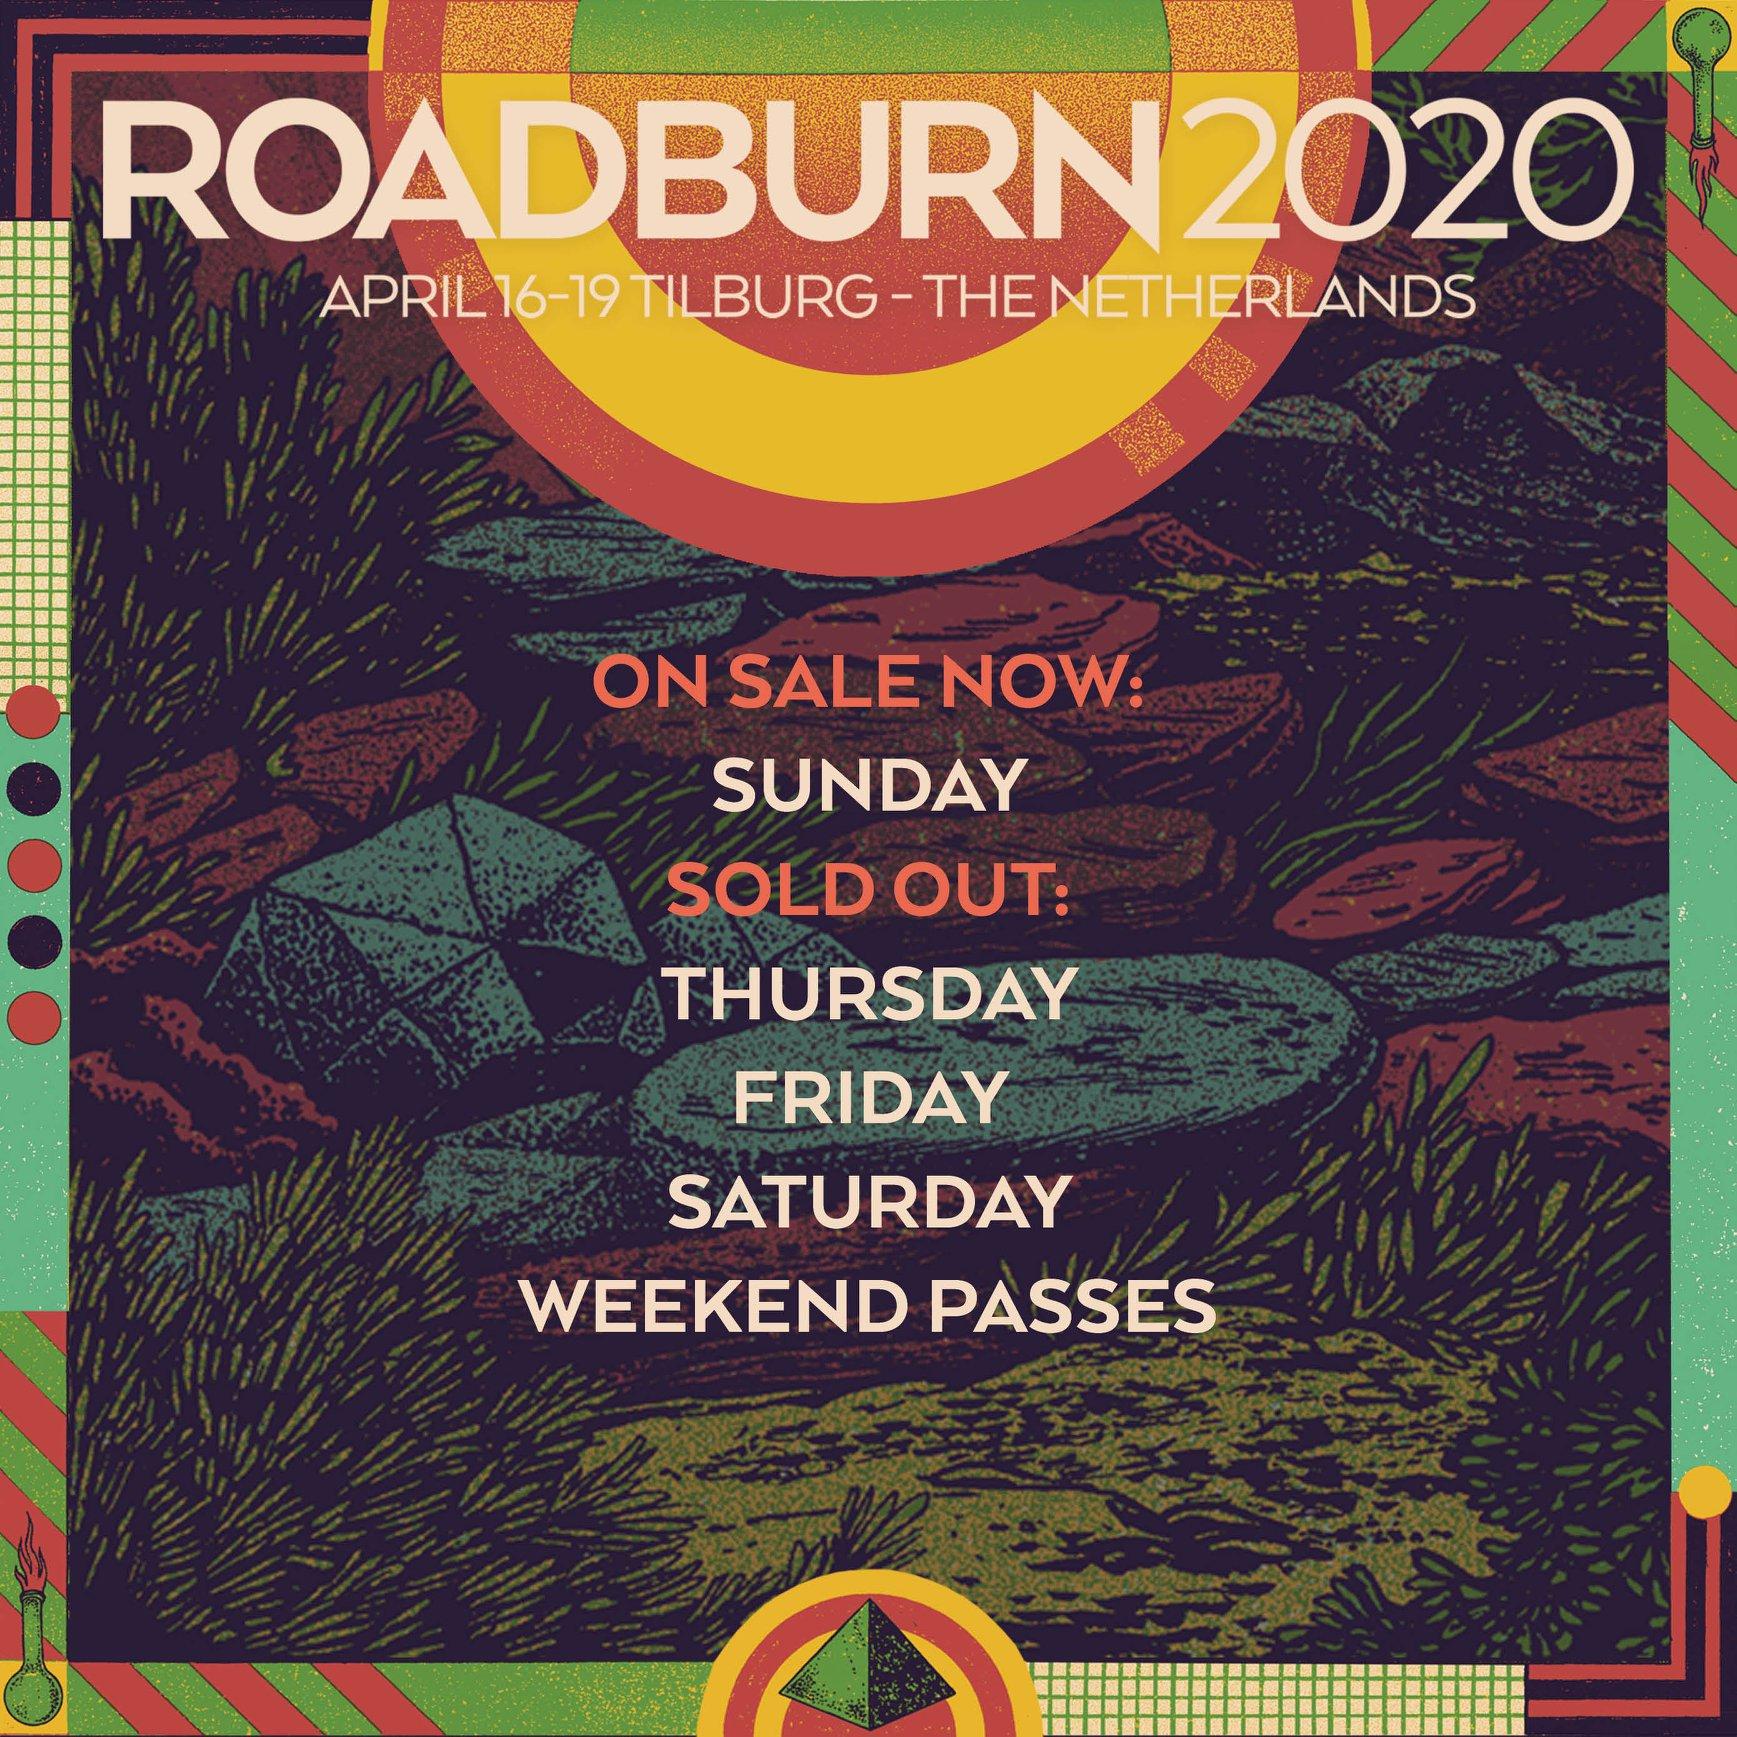 roadburn 2020 selling like hotcakes